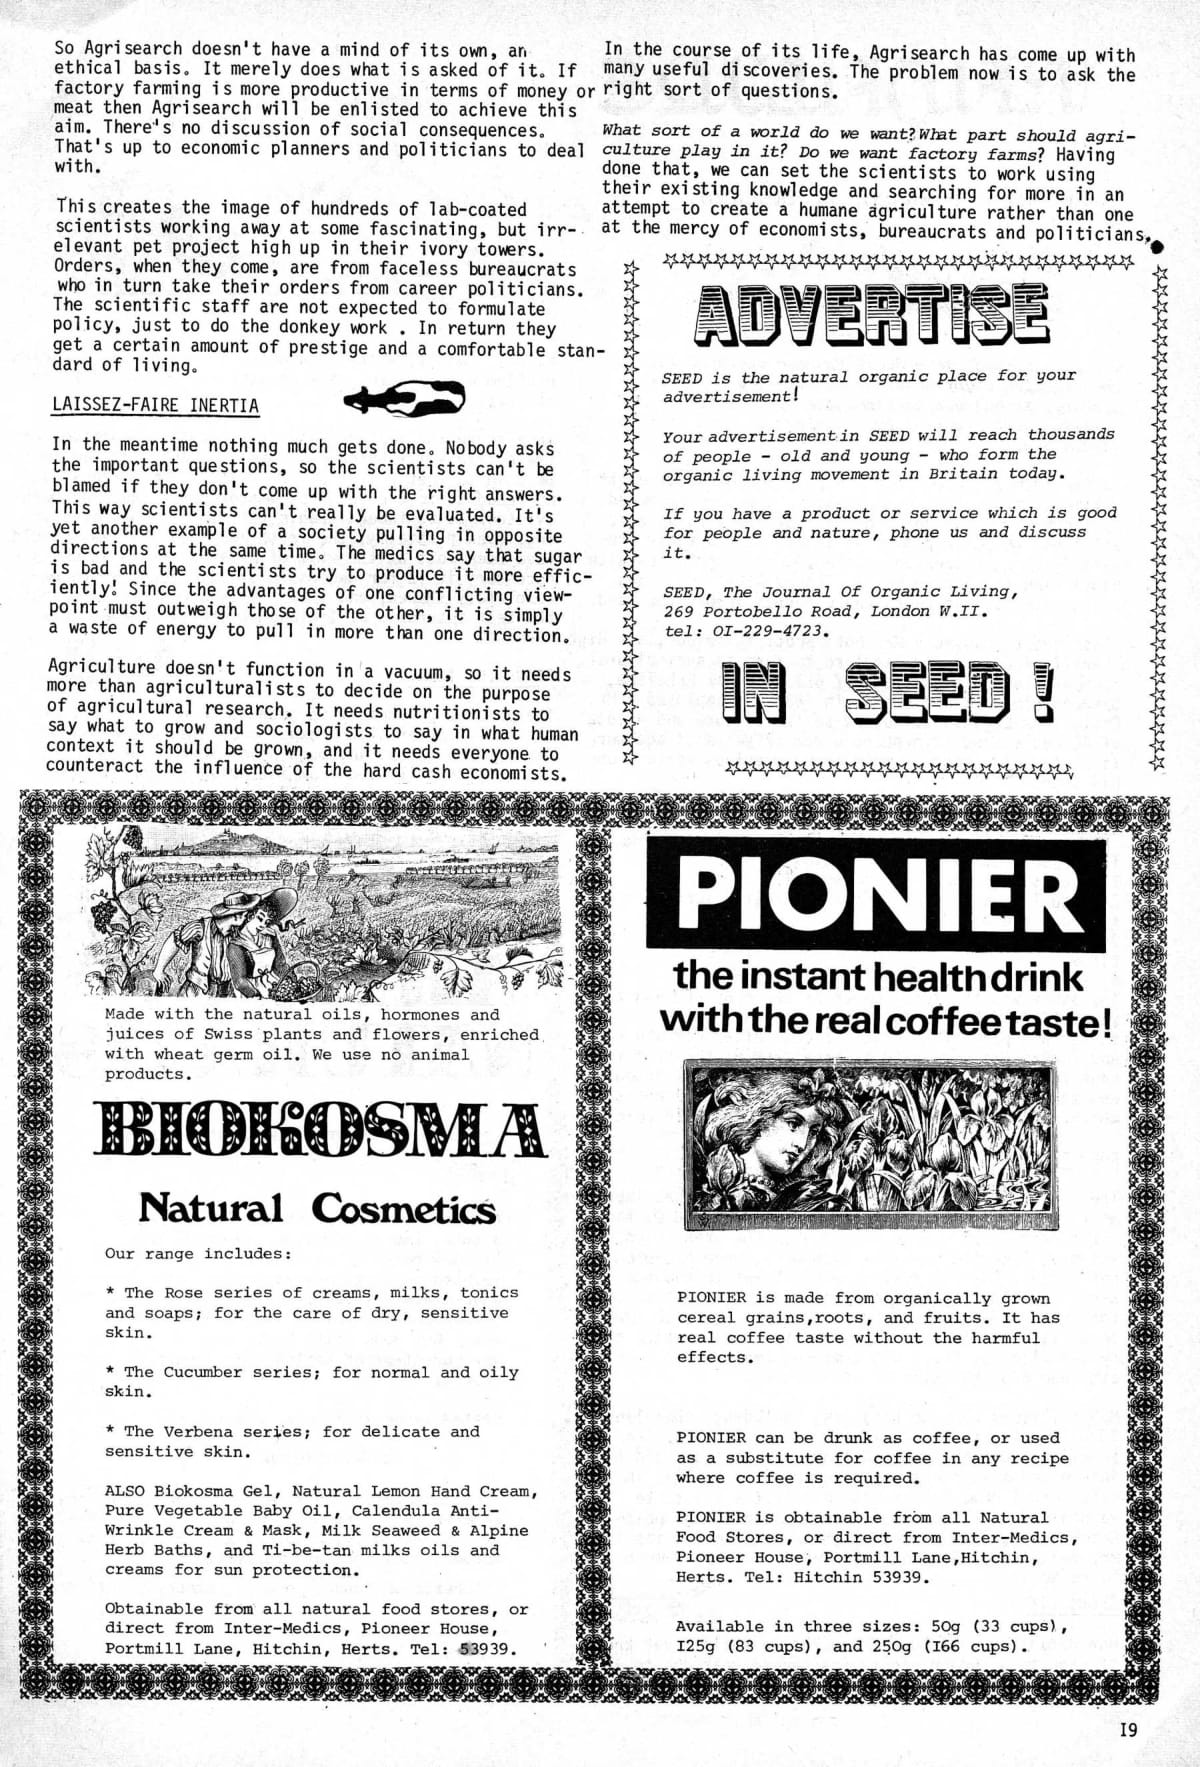 seed-v3-n4-april1974-19.jpg